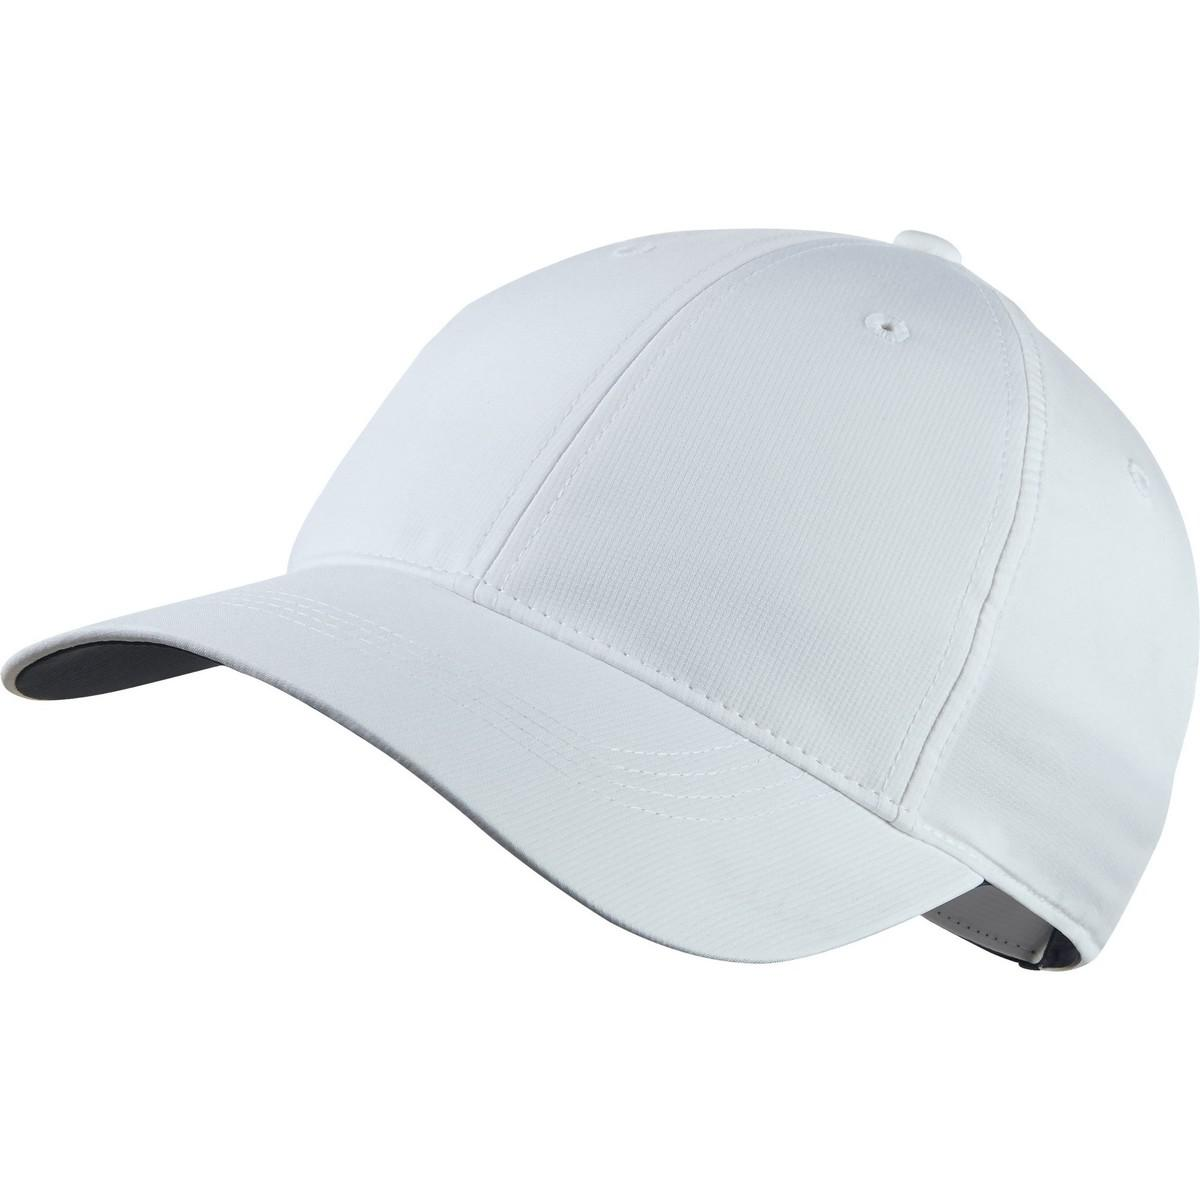 Nike Adults Unisex Legacy 91 Custom Tech Baseball Cap Men s Cap In ... c5a191805411